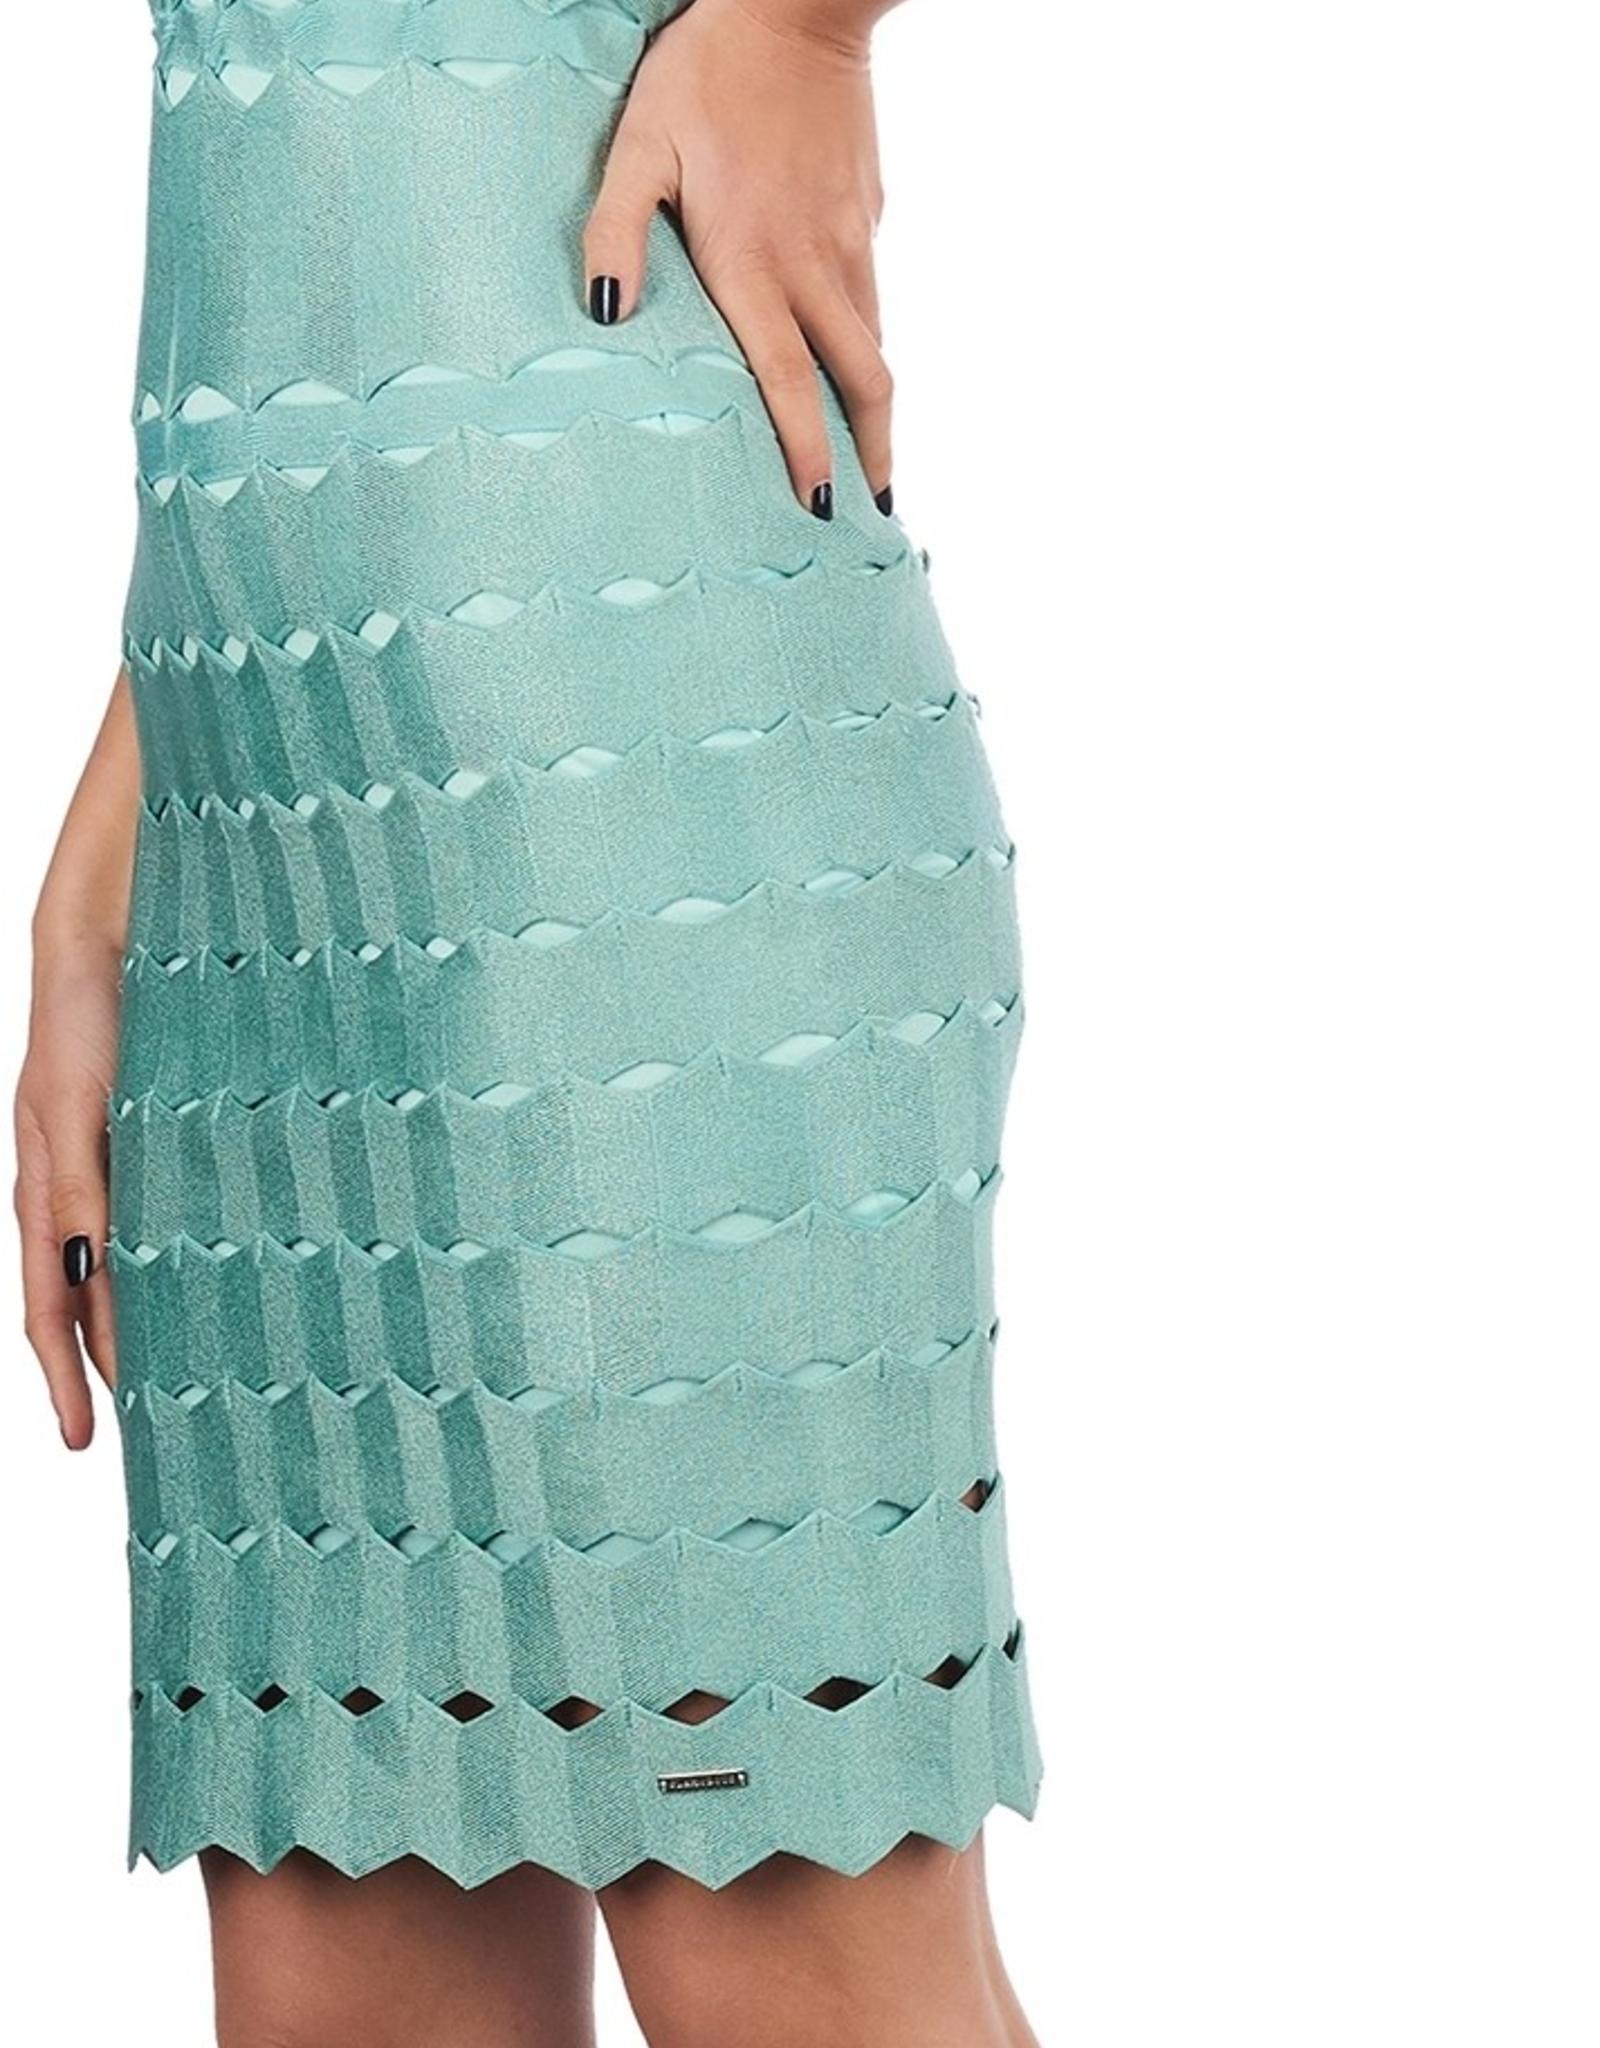 Zarah dress Green Glamorous